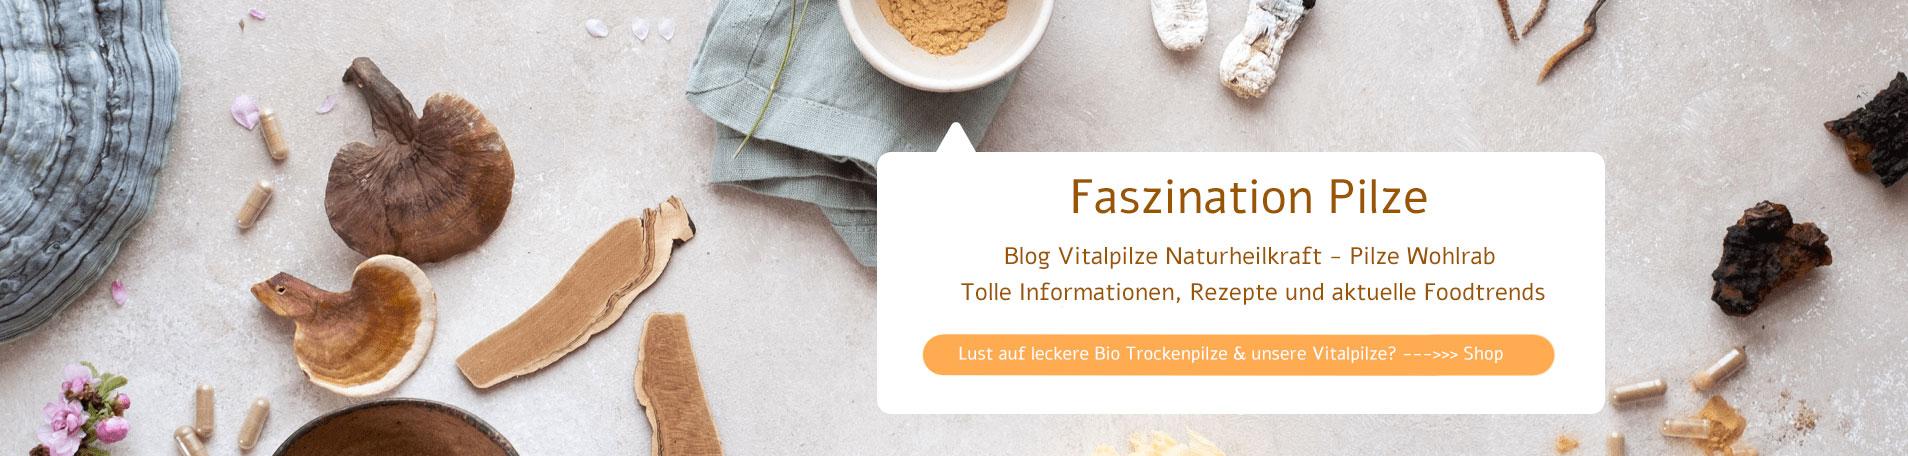 Vom Vitalpilze Blog zum Shop